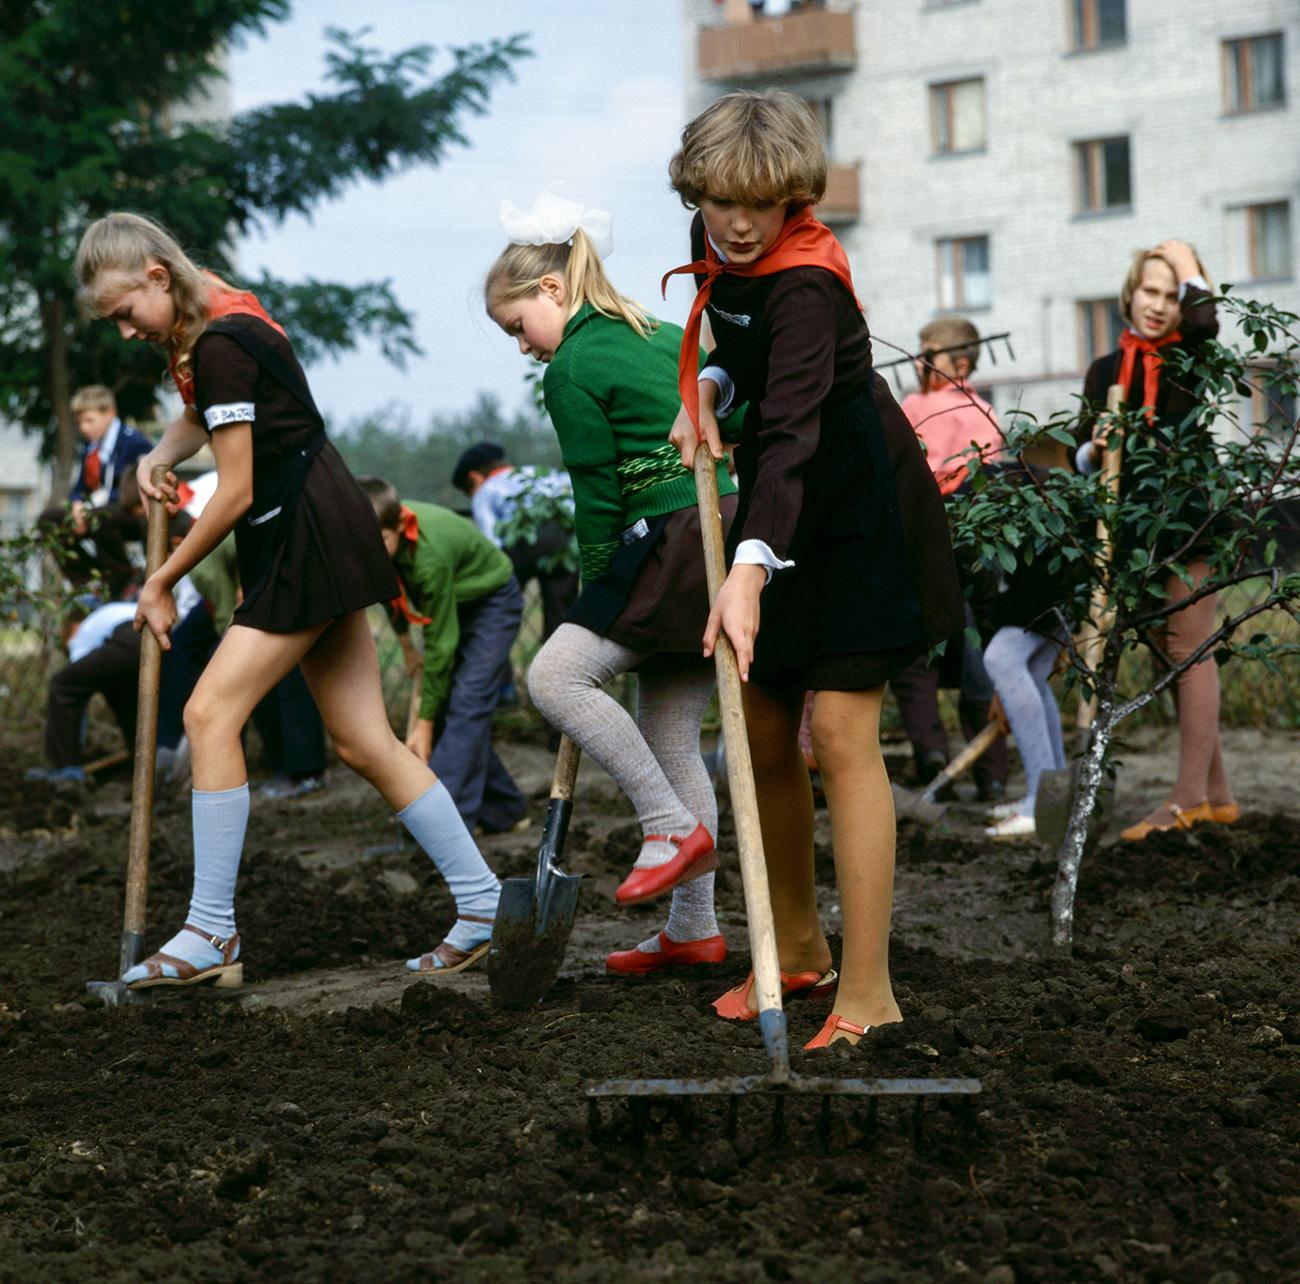 Anggota Pionir Schastye (kebahagiaan). Gerakan pionir kota Schastye bekerja pada kegiatan Subbotniks, 1 September 1980. Sumber: Boris Kavashkin / TASS